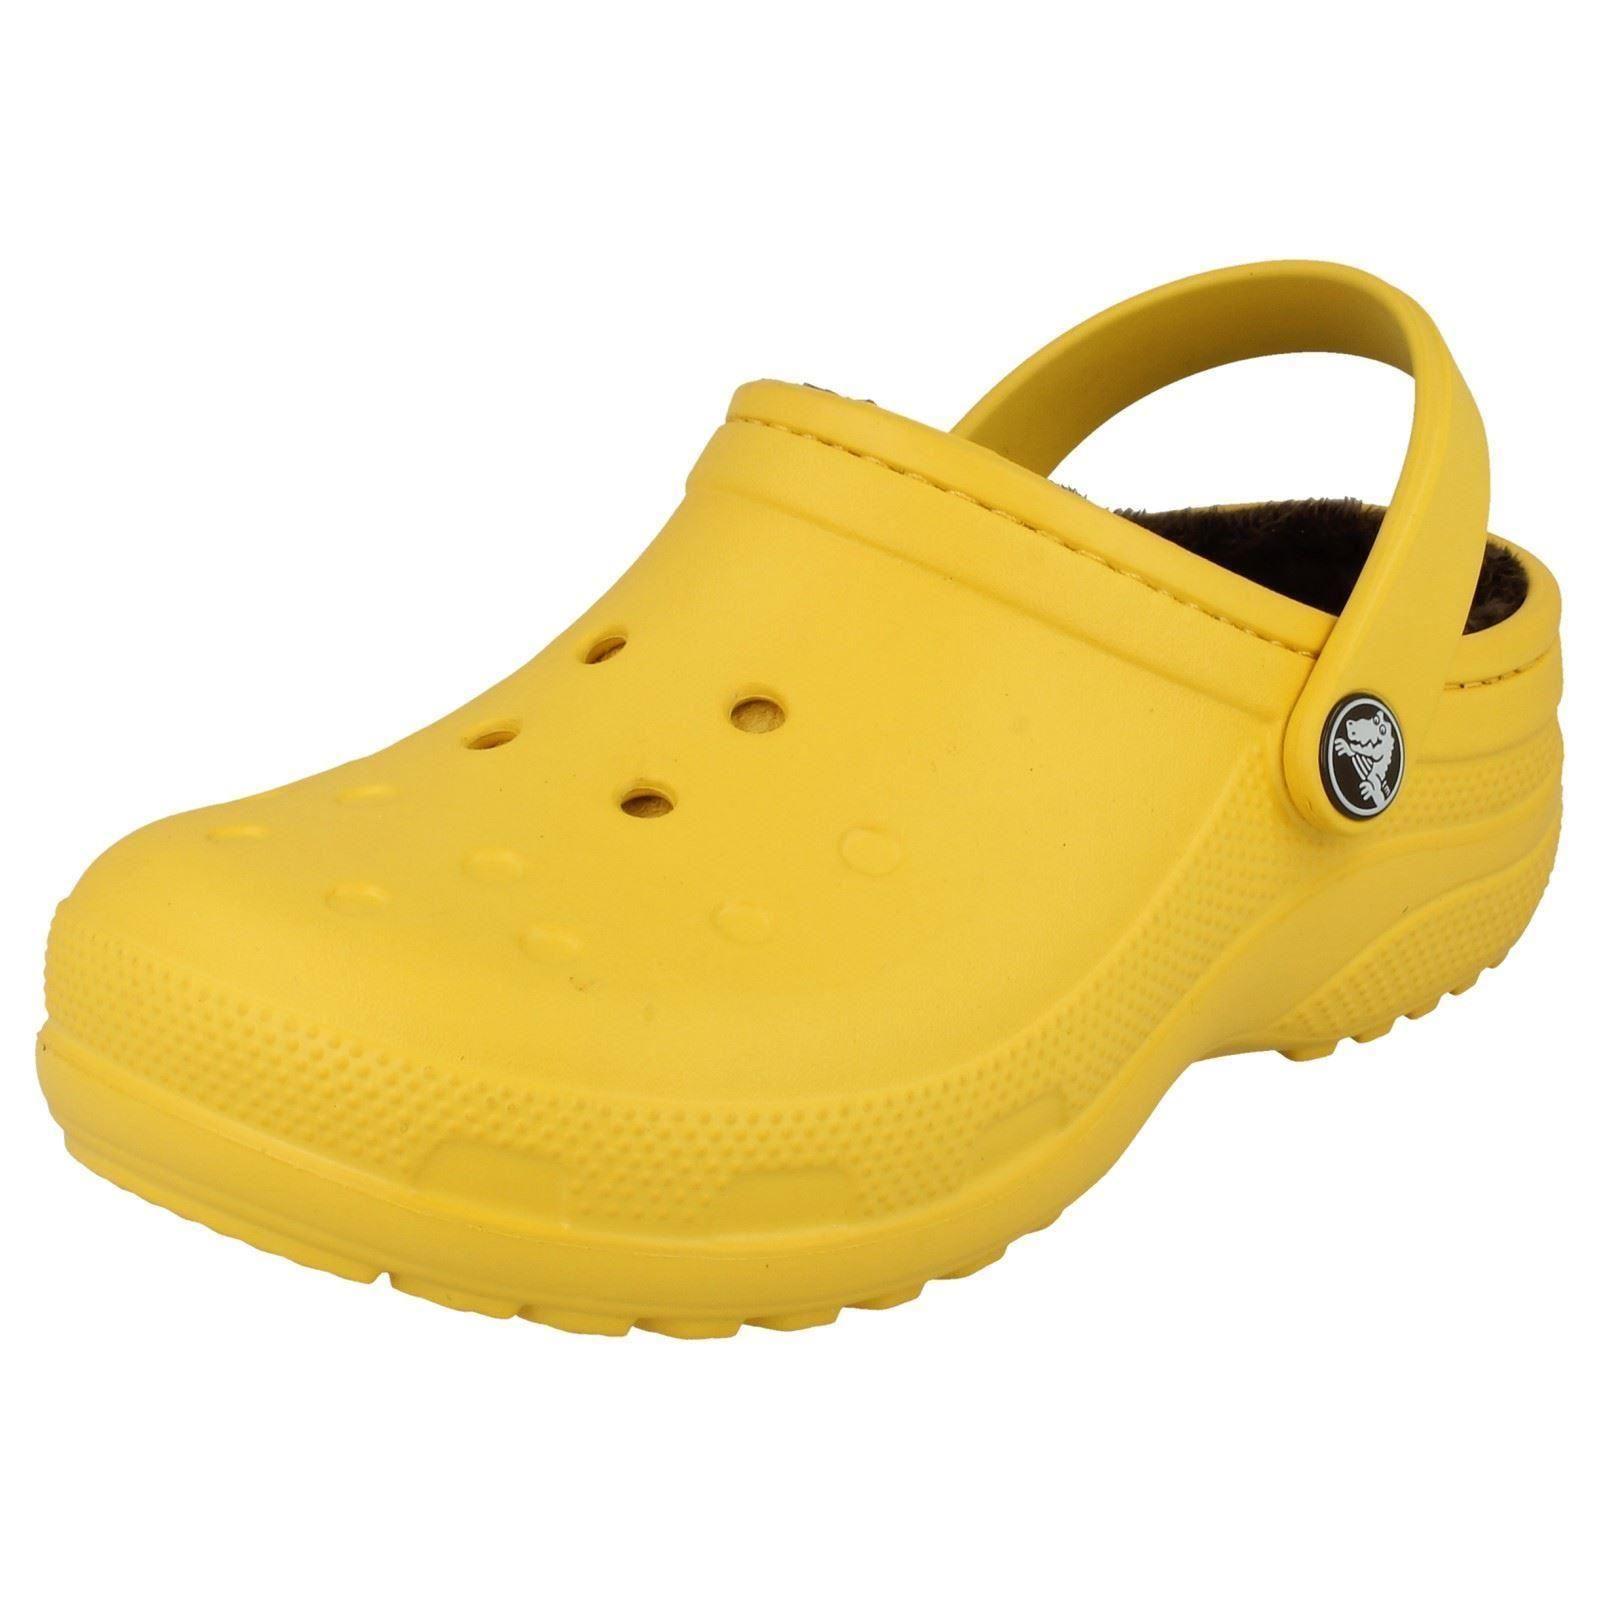 0d9499dd4 Crocs Childrens Unisex Slip On Clogs - Boundless Clog Kids